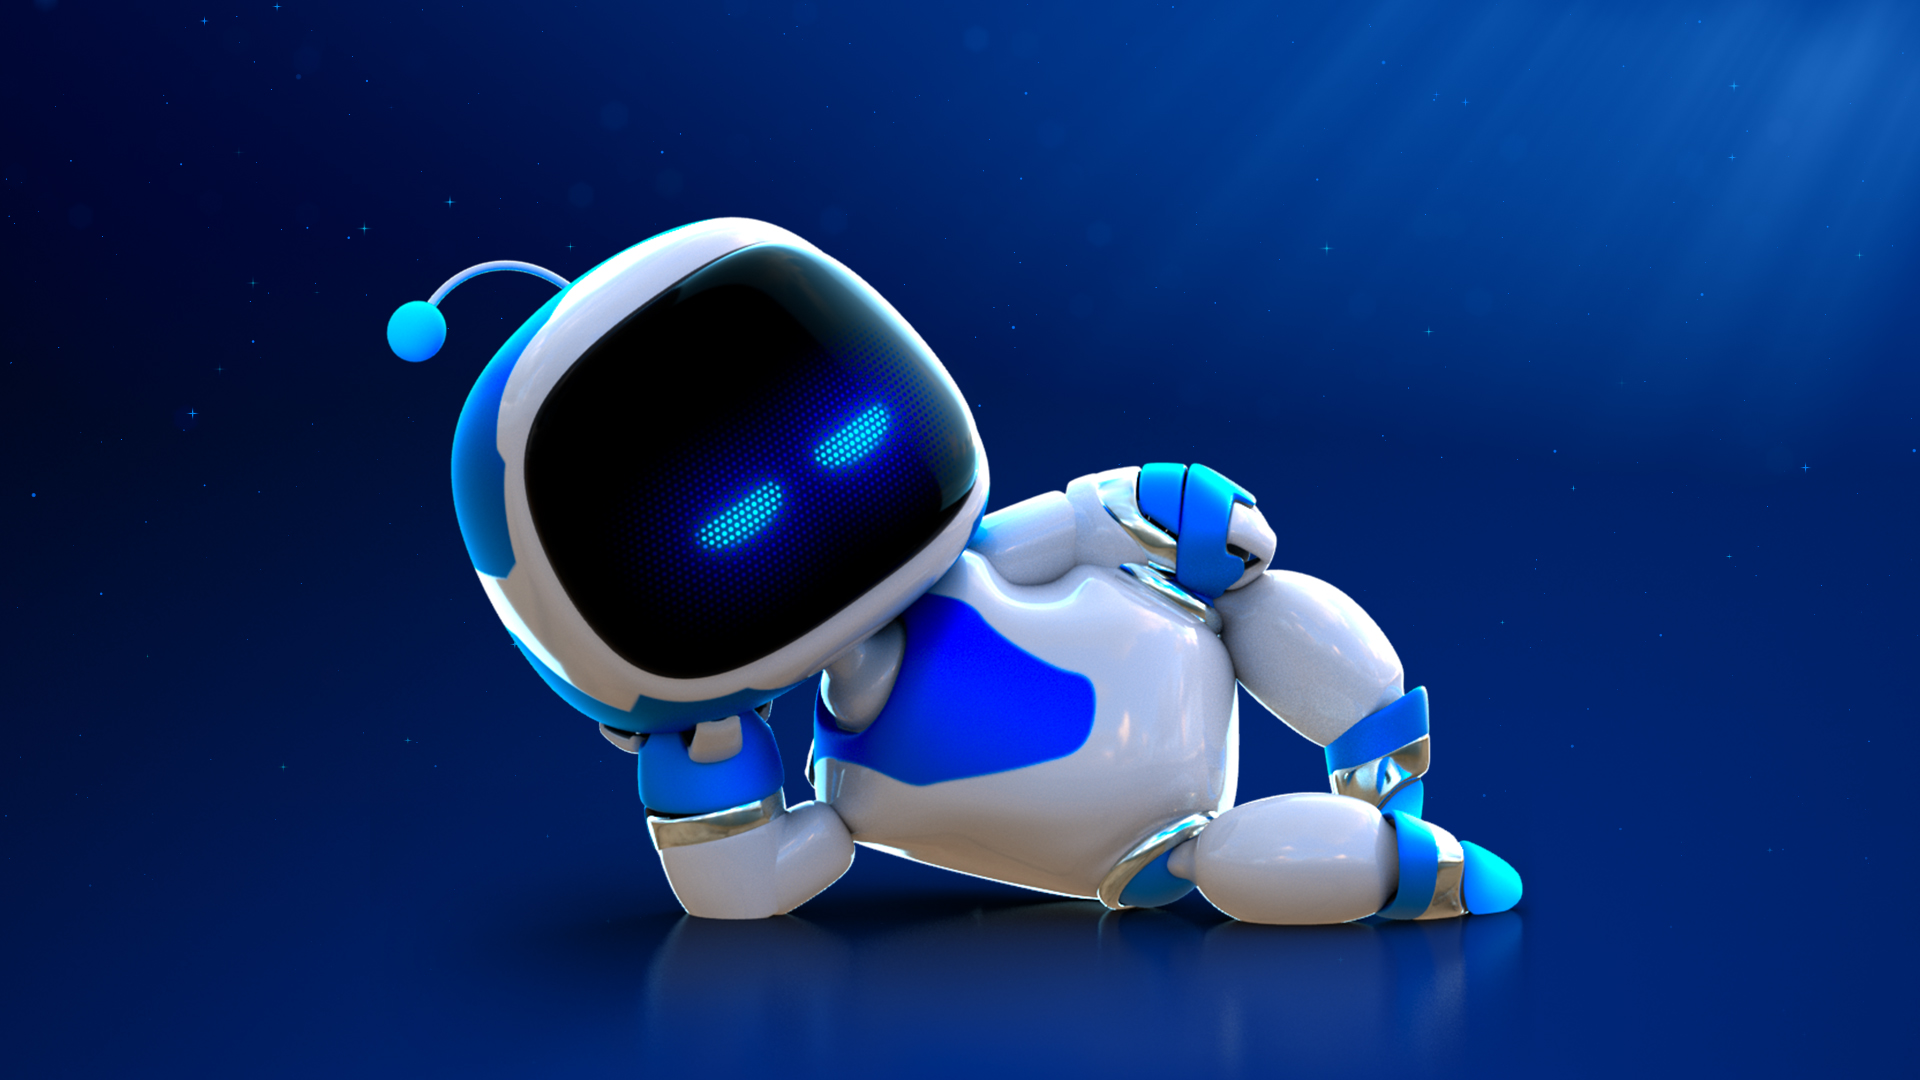 astro bot rescue mission desktop wallpaper 67753